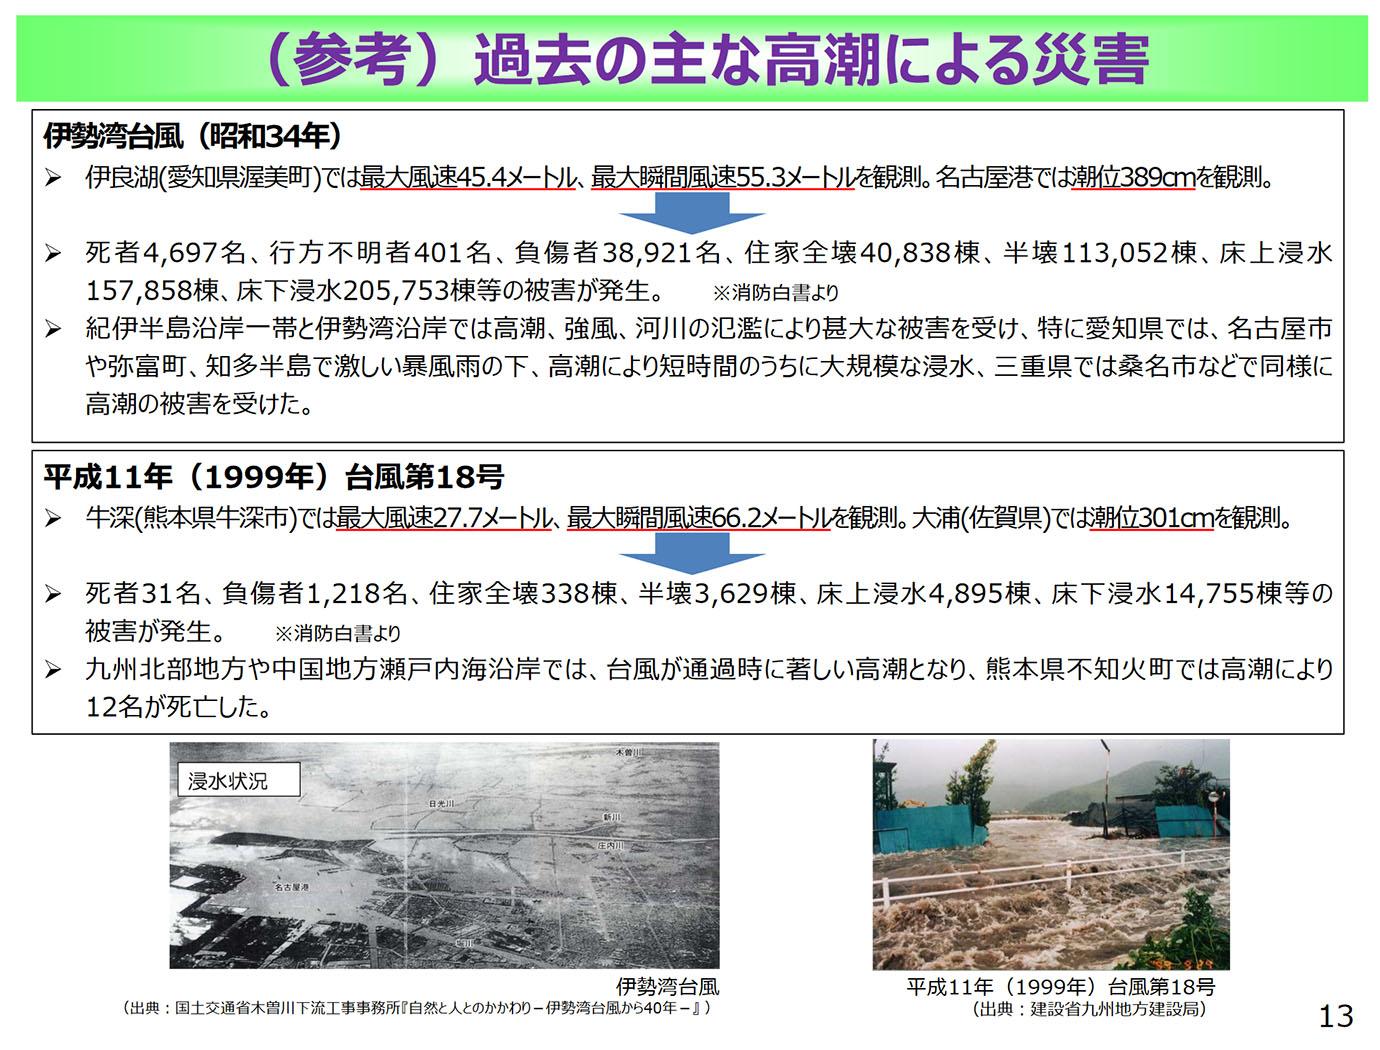 typhoon-emergency-evacuation-news8